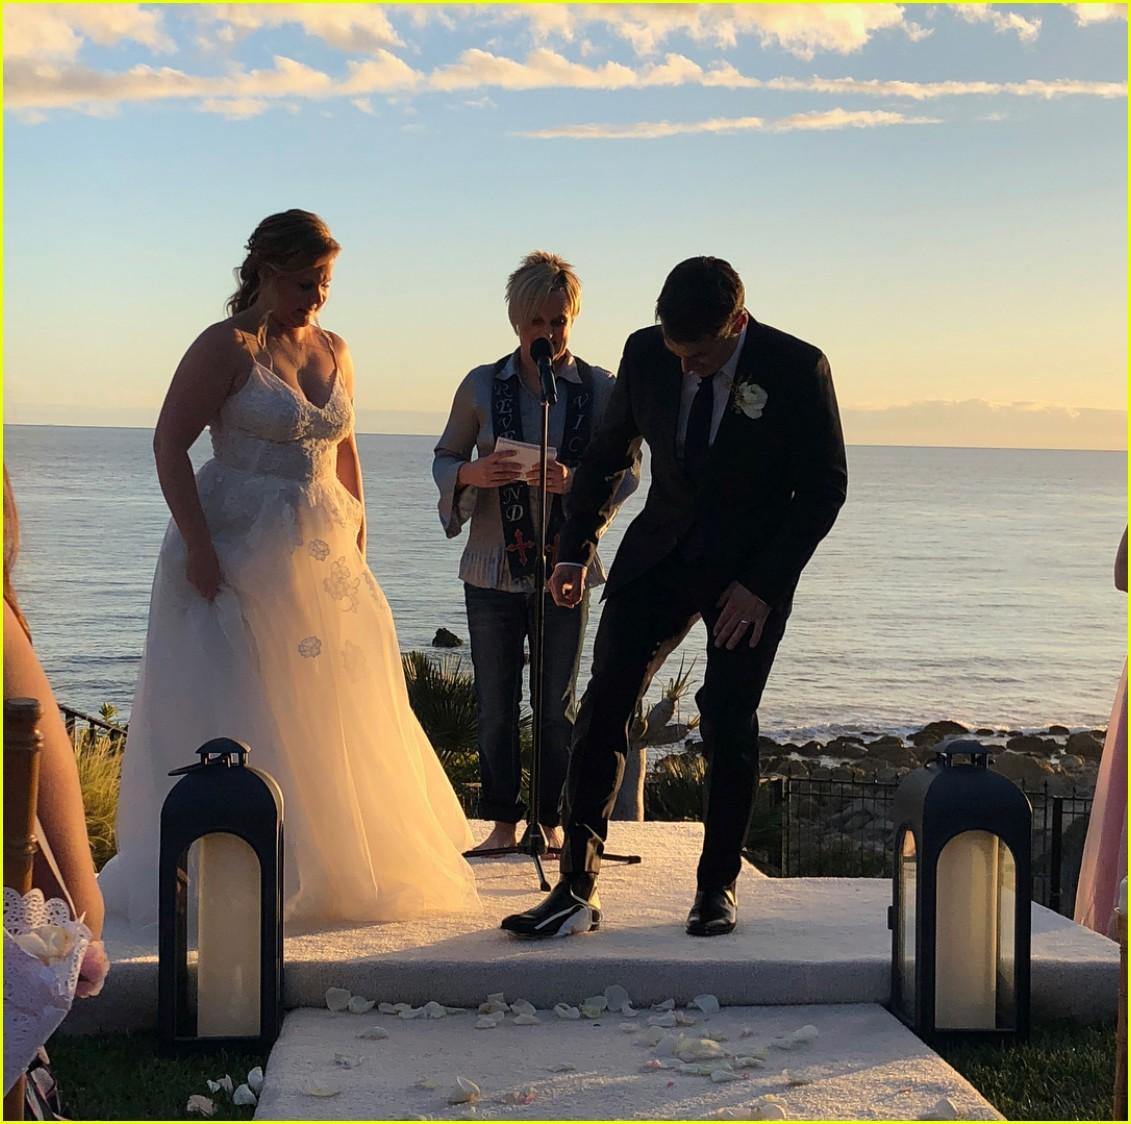 boda amy schumer ceremonia judia novio chris fischer